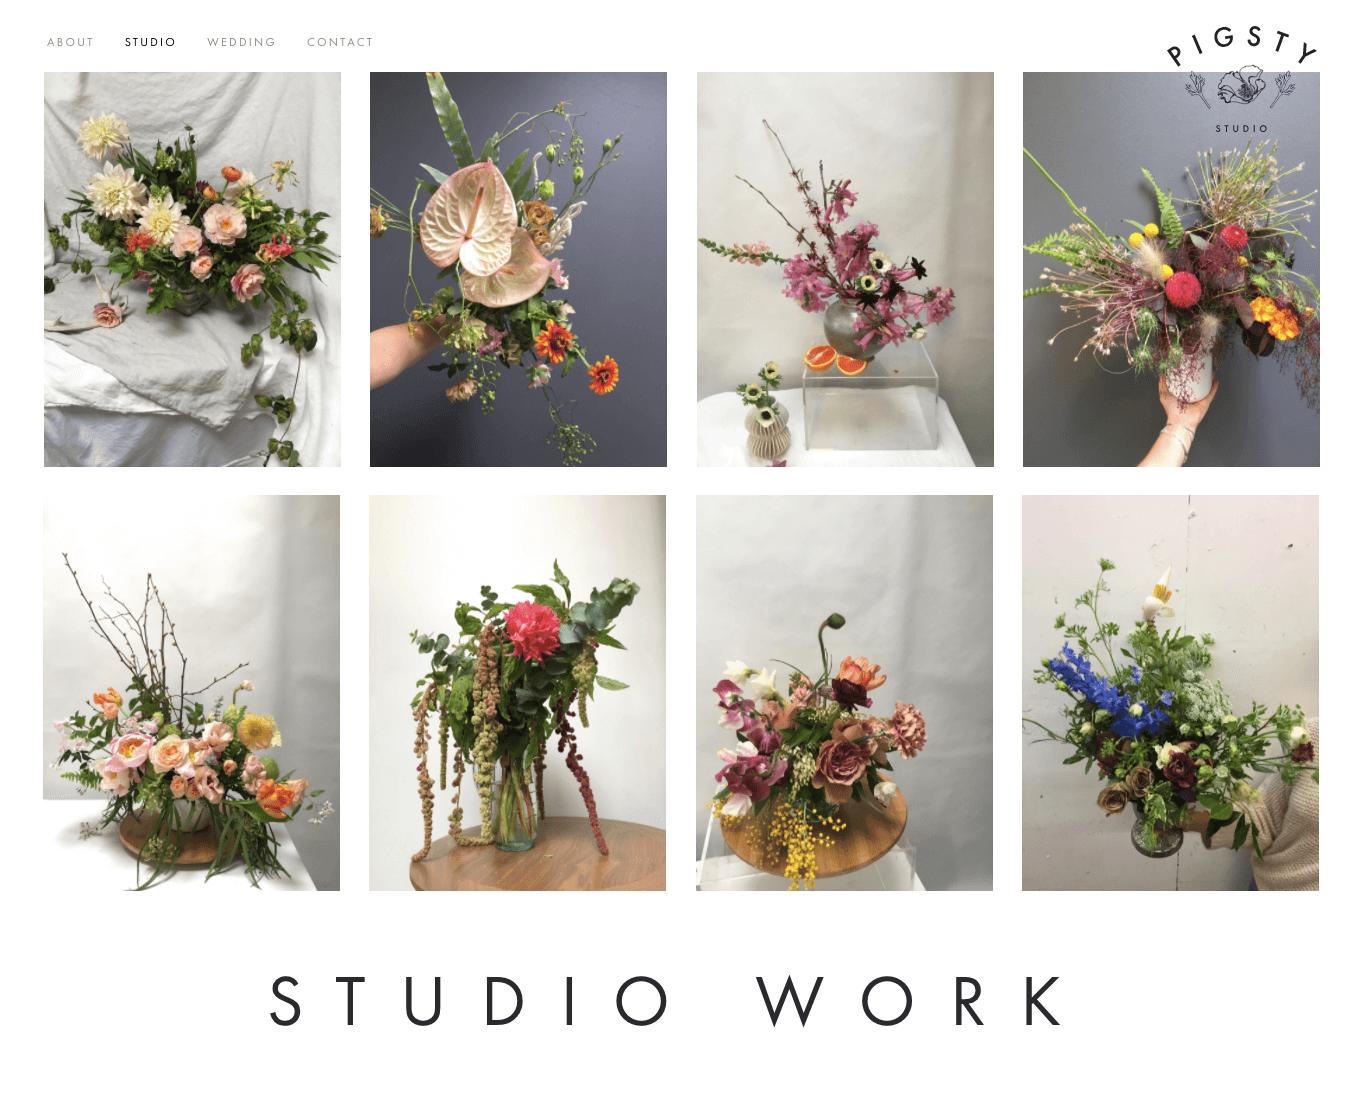 studiowork-juliettedonatelli